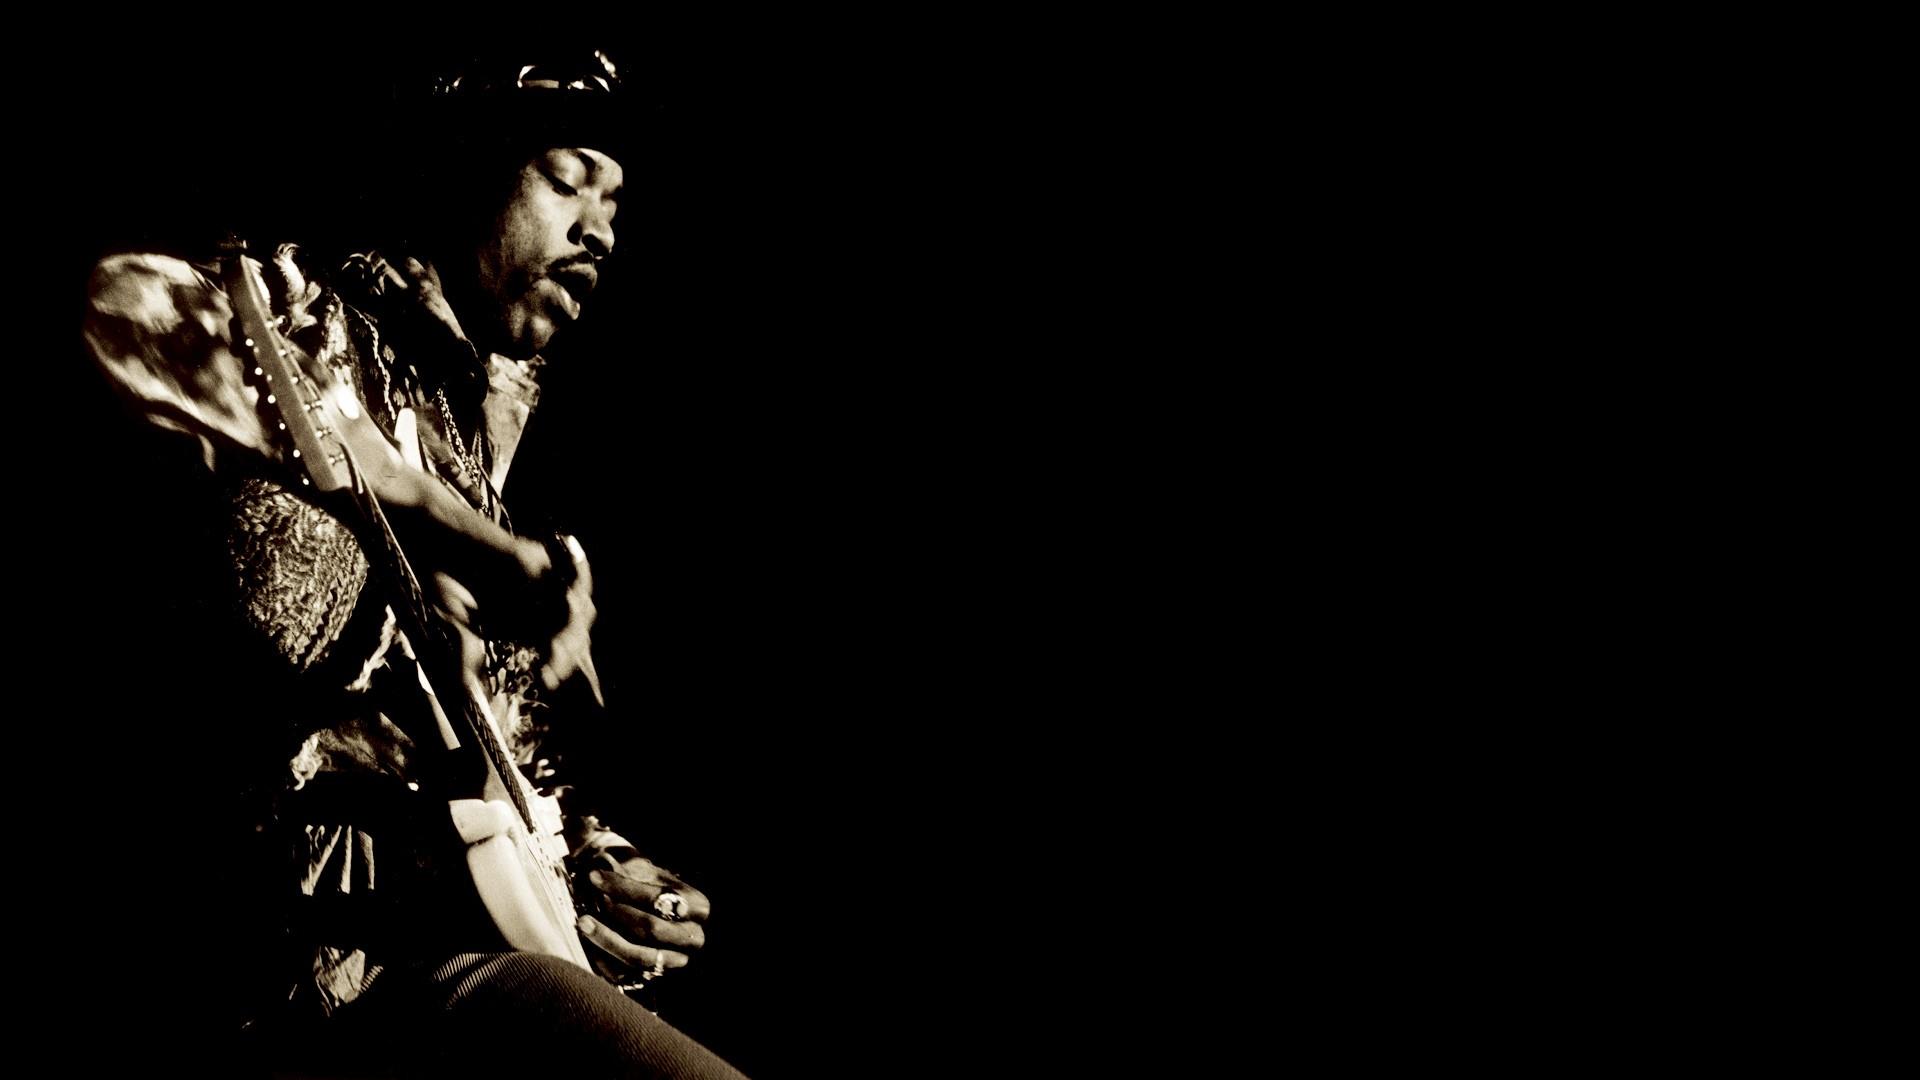 Jimi Hendrix wallpaper ·① Download free High Resolution ...